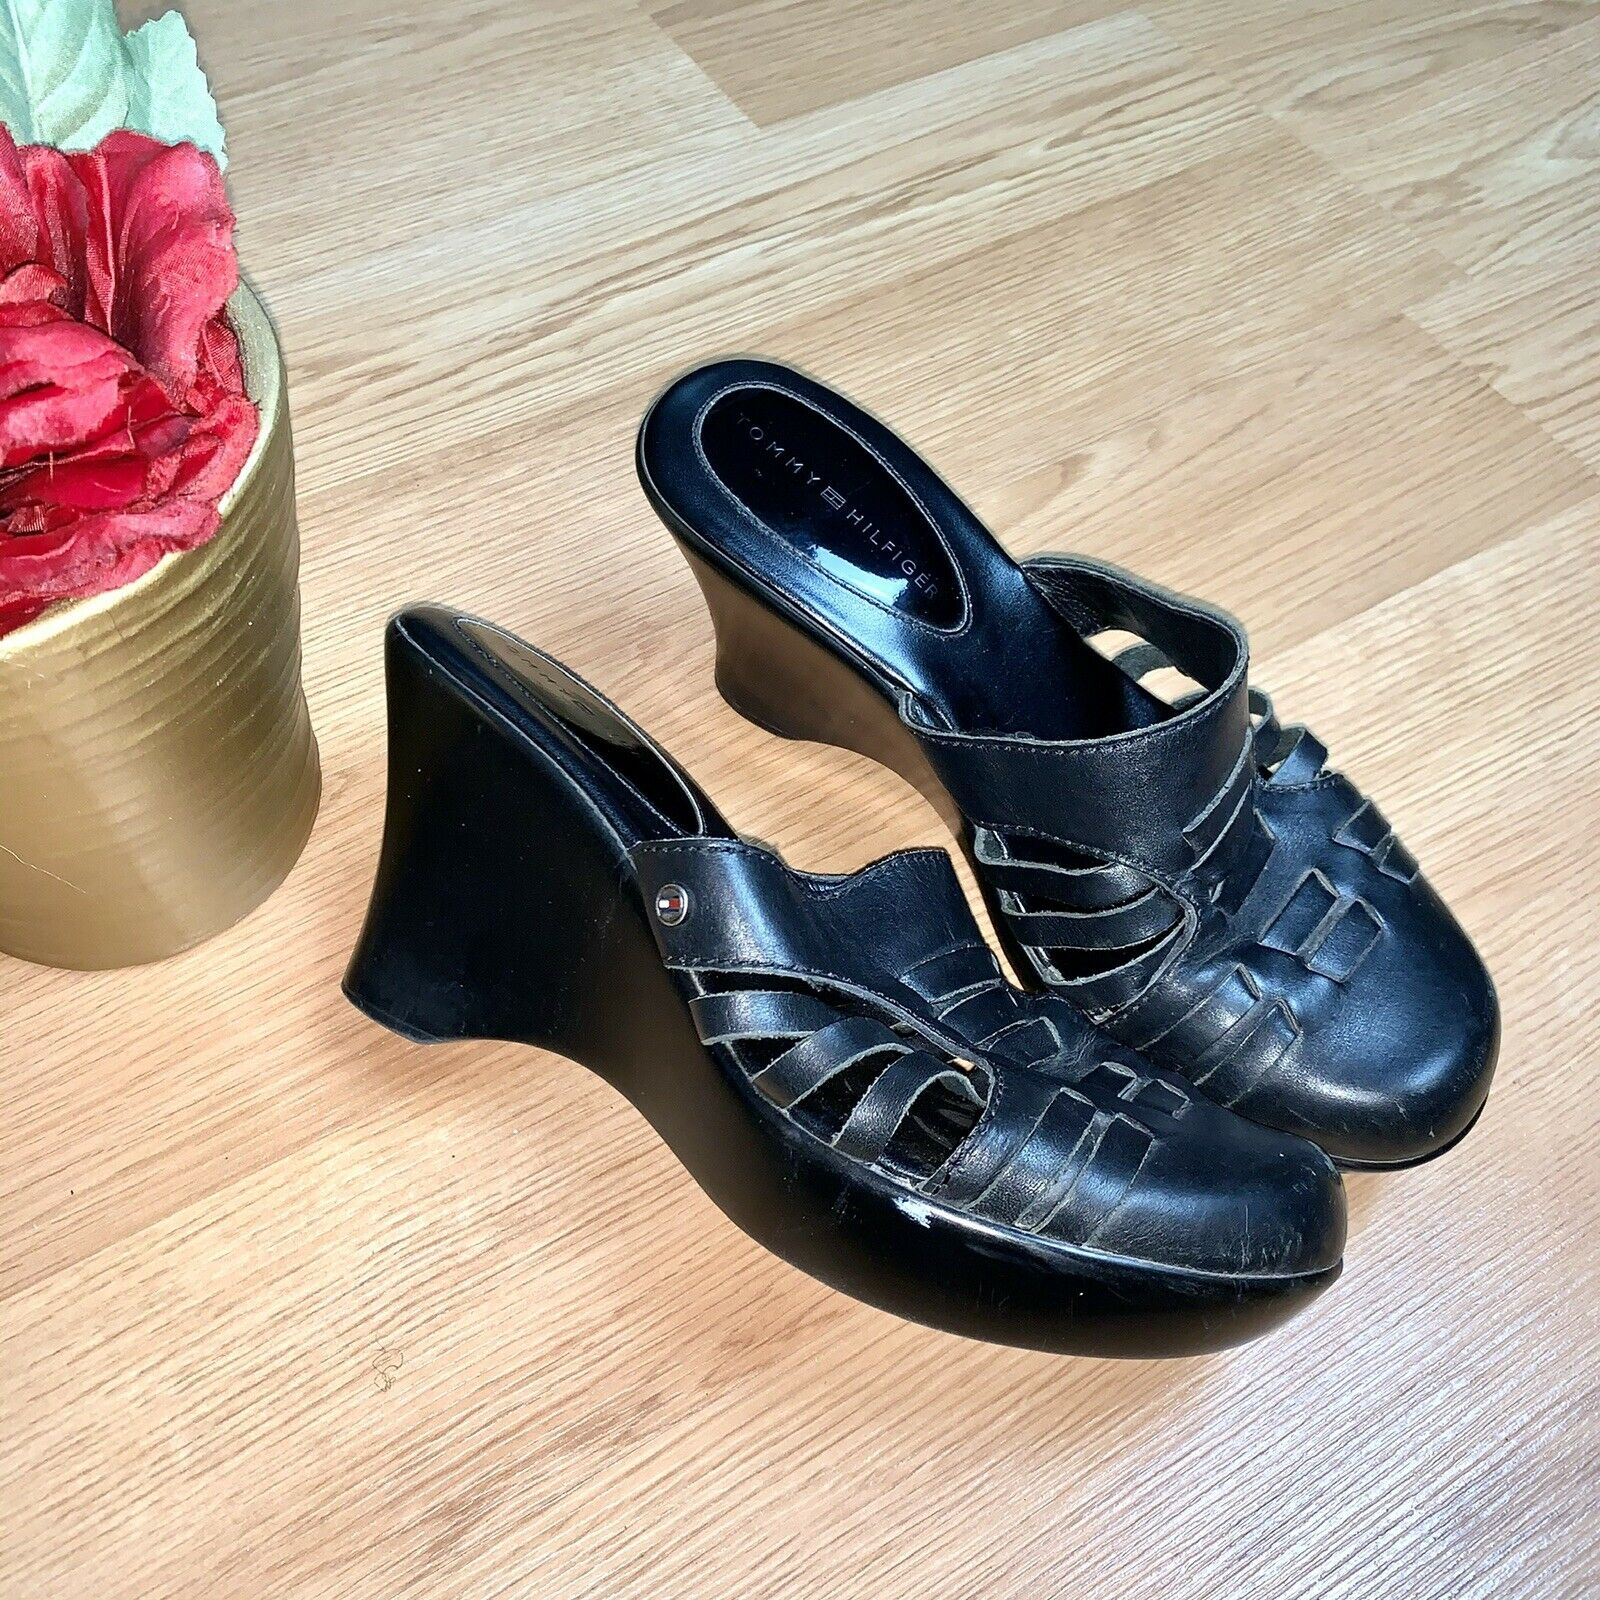 Tommy Hilfiger  Black Mule Leather Wedges Size 8 - image 6